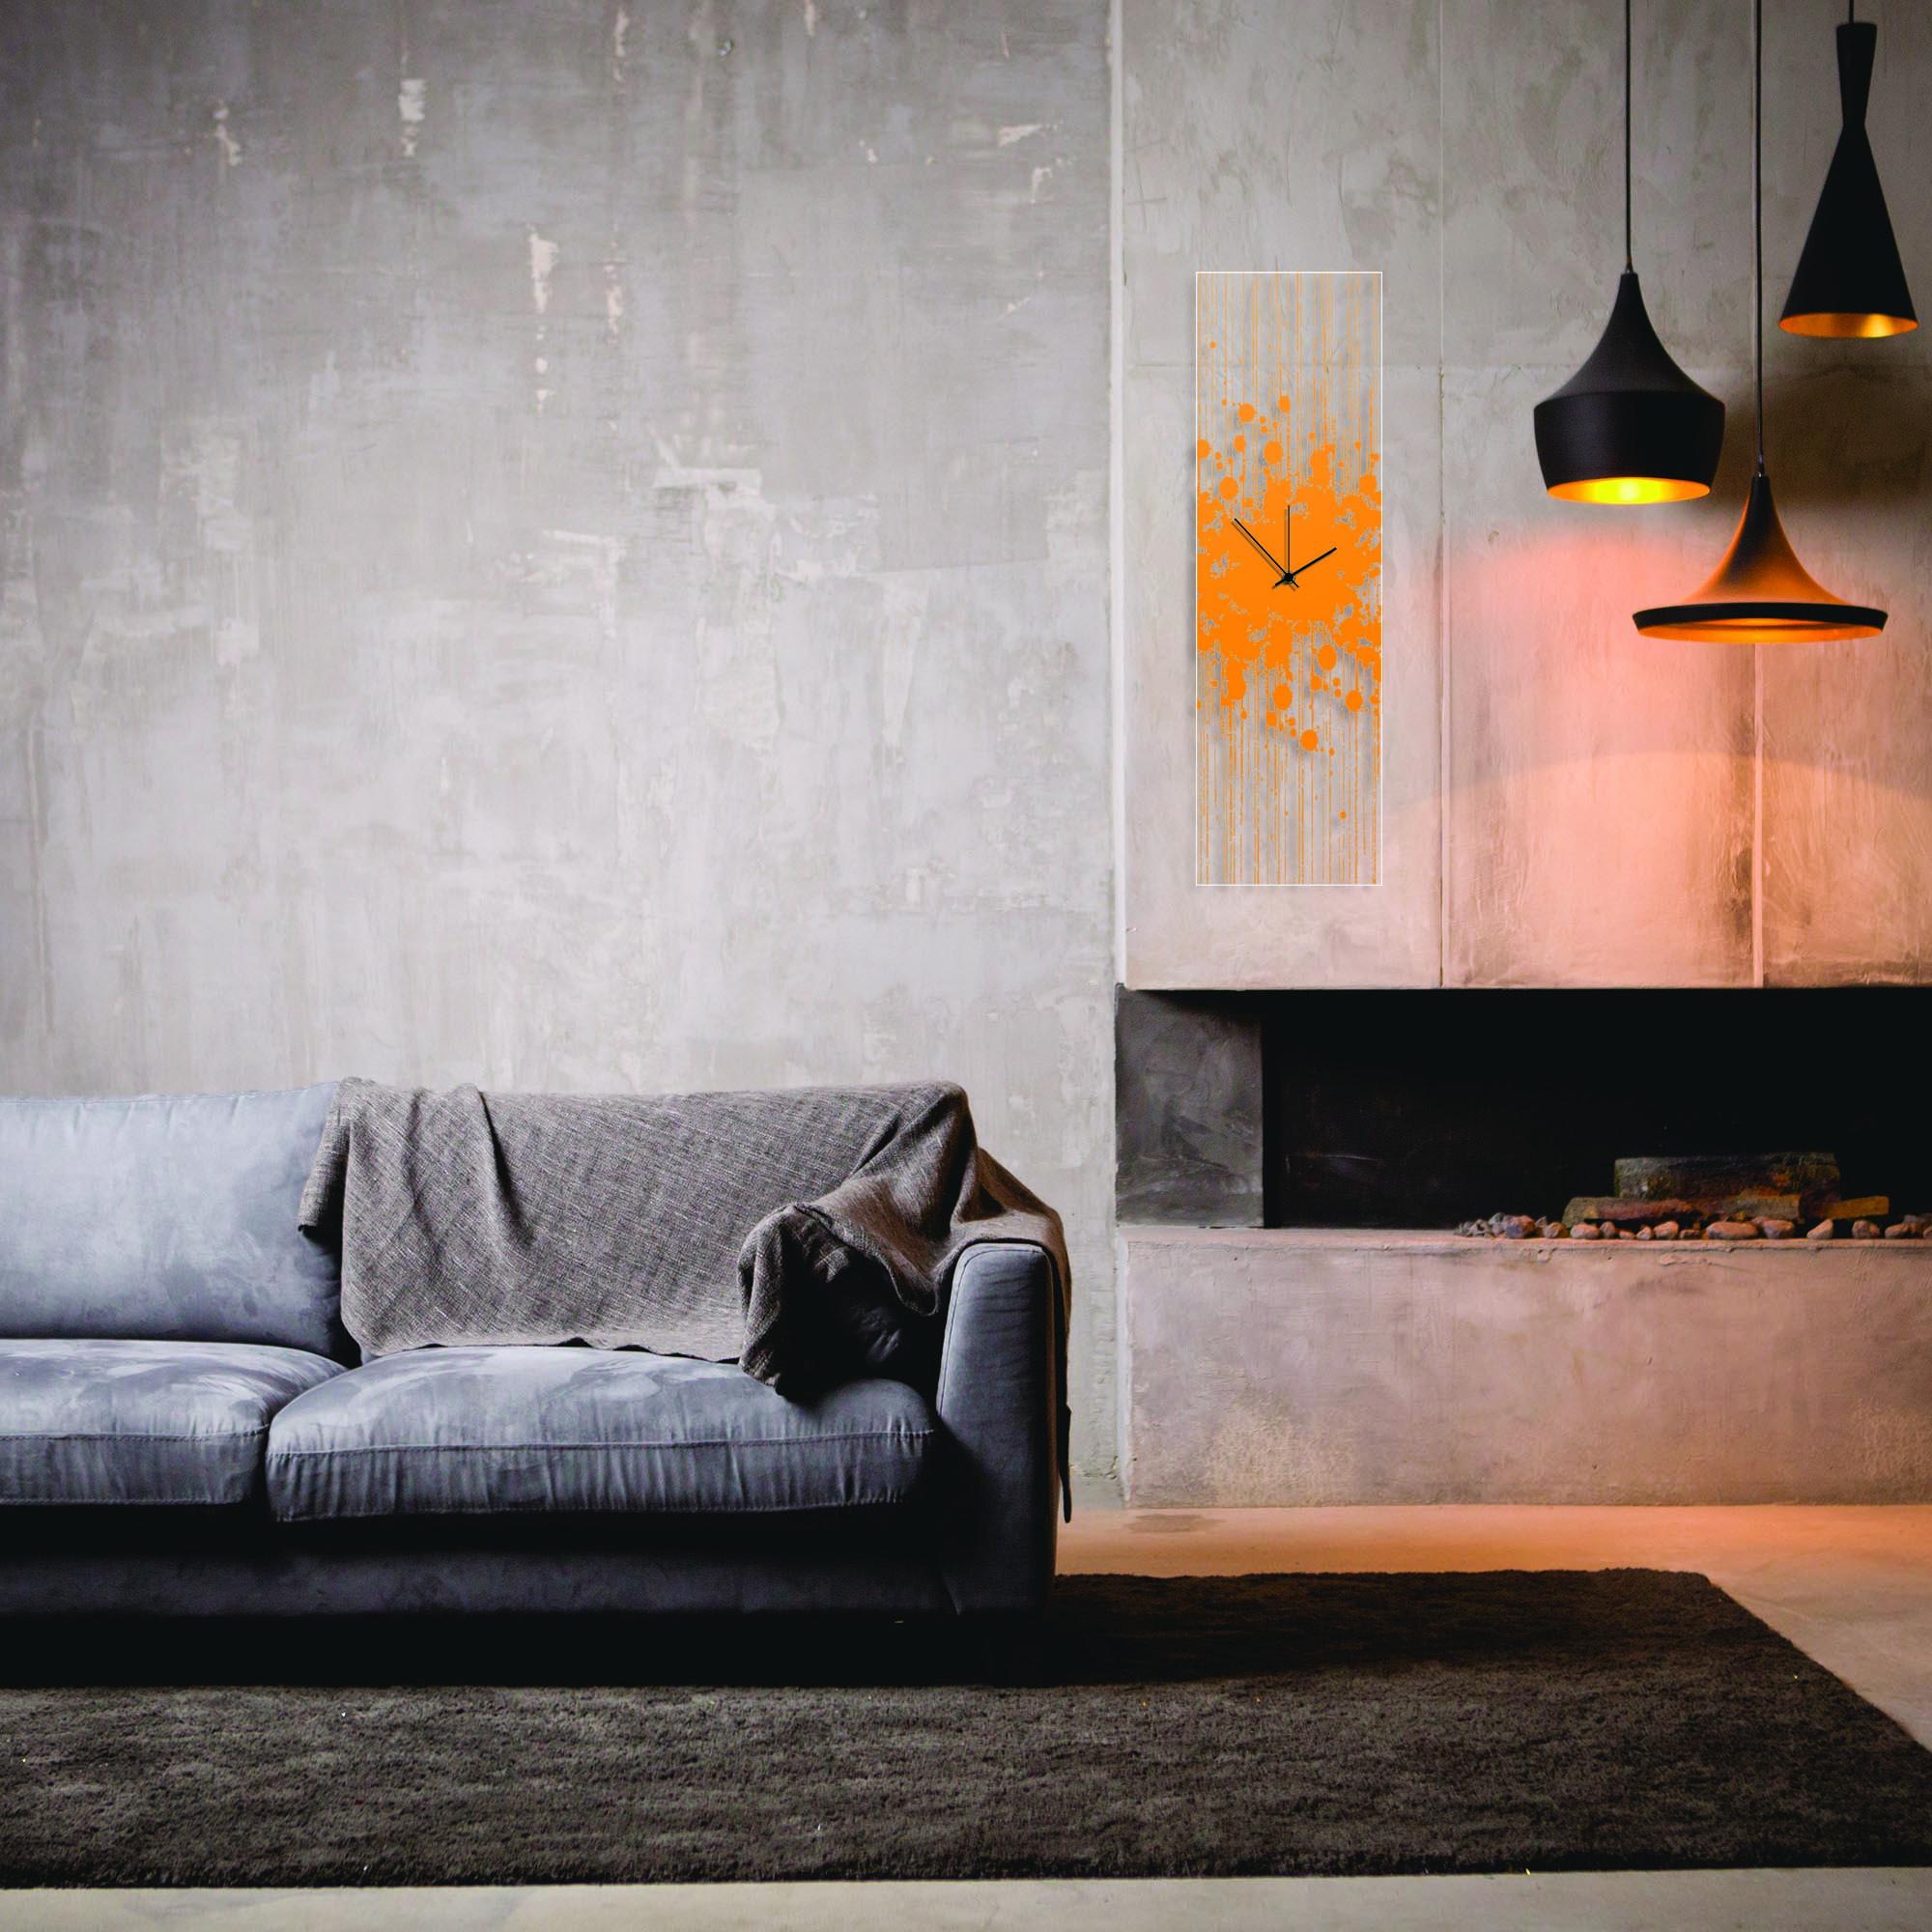 Orange Paint Splatter Clock by Adam Schwoeppe Contemporary Decor on Plexiglass - Lifestyle View